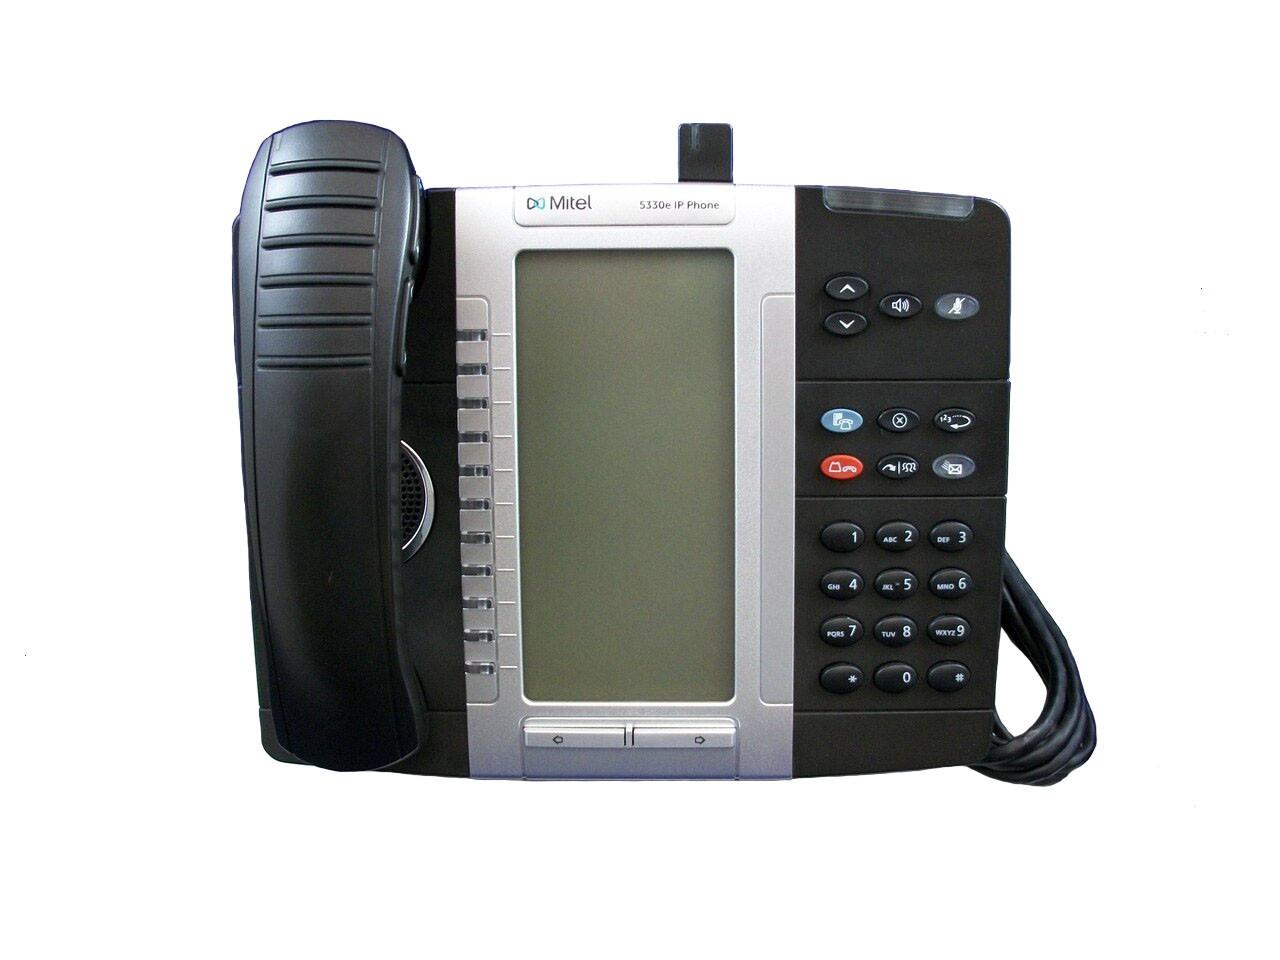 Mitel 5330e IP Phone 50006476 Includes 50005711 Cordless Handset & Module